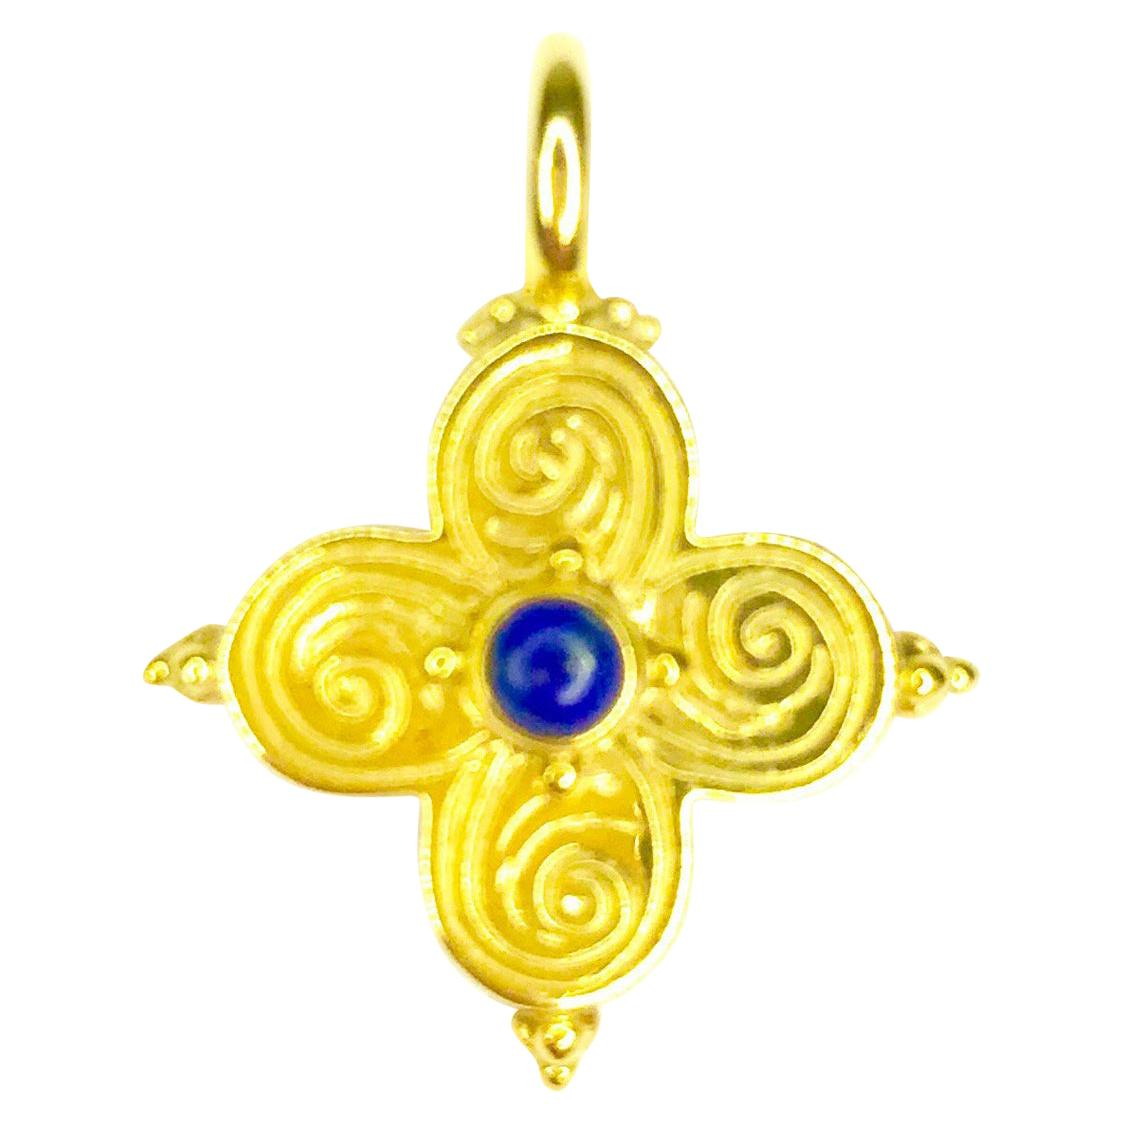 Gemolithos Modern Lapis Lazuli 18 Karat Gold Cross Pendant for Every Day